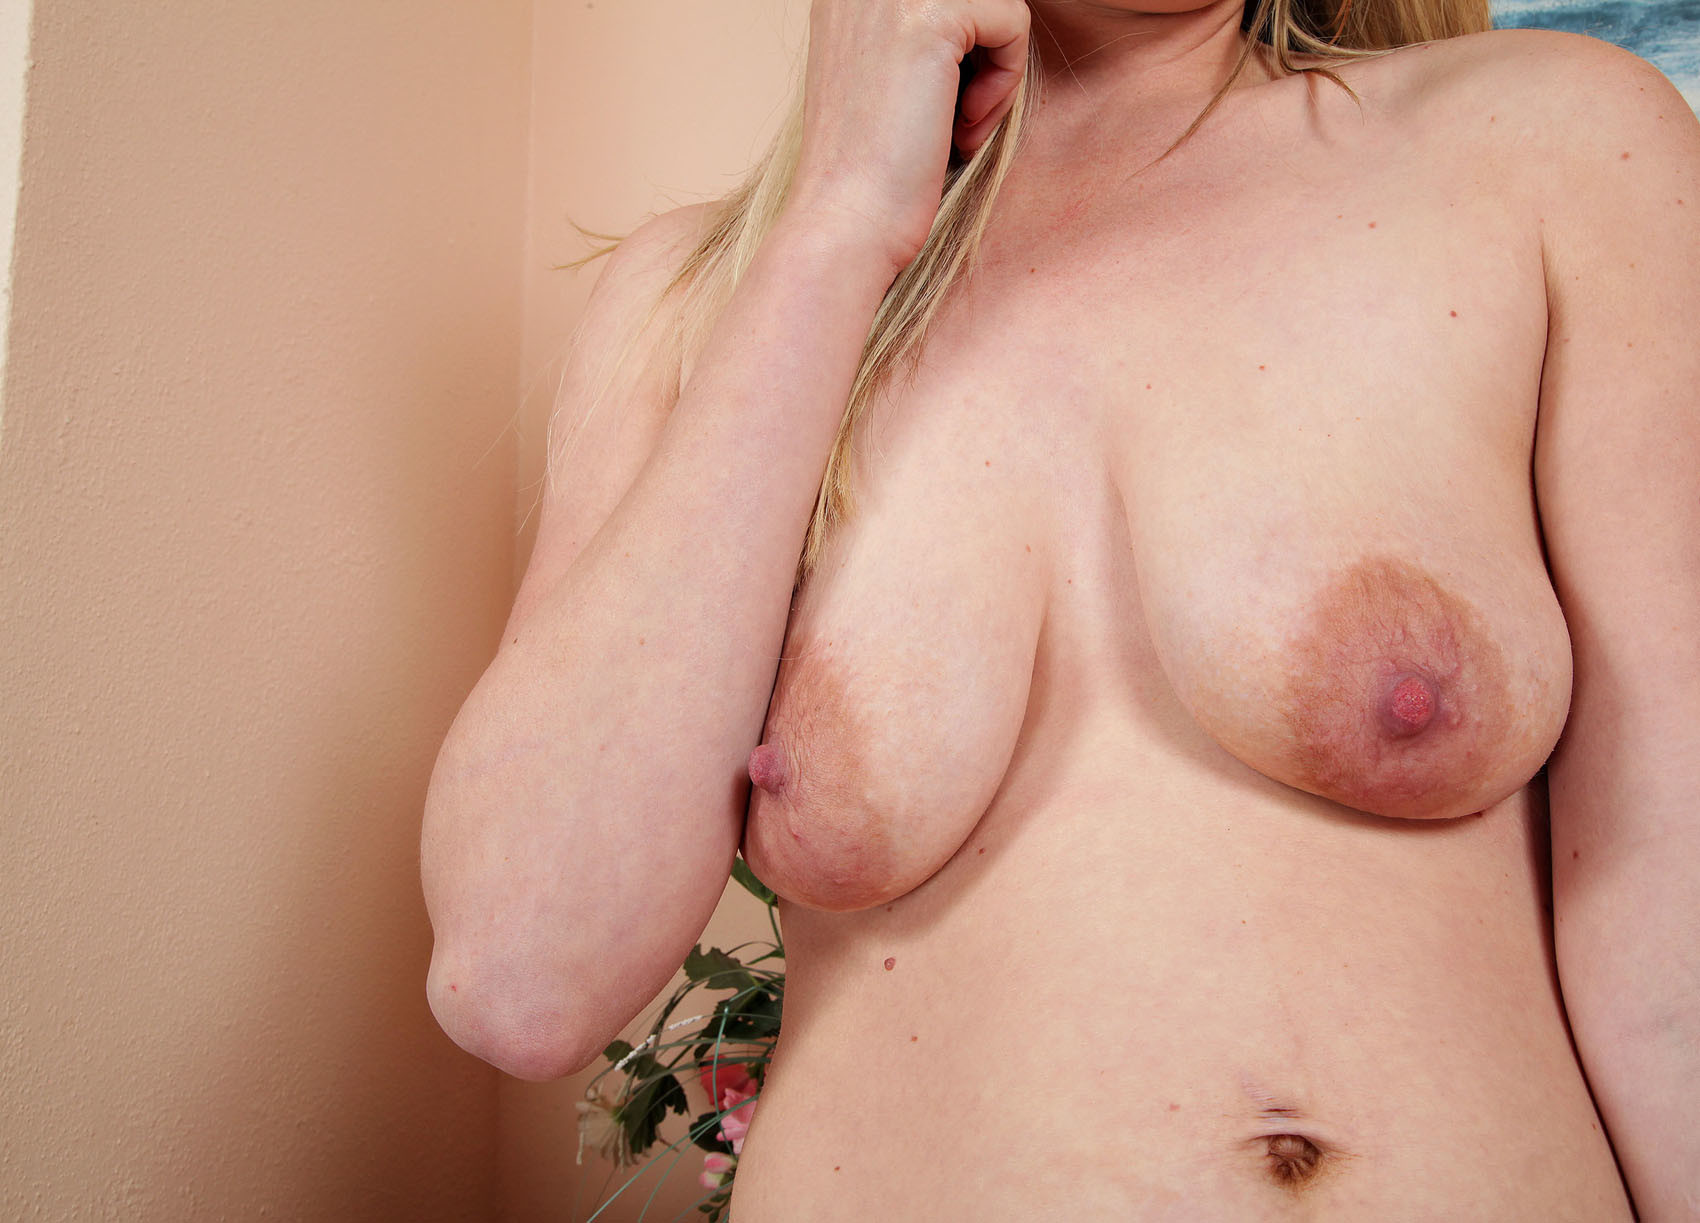 Девушка с обвисшими грудями с фото голые